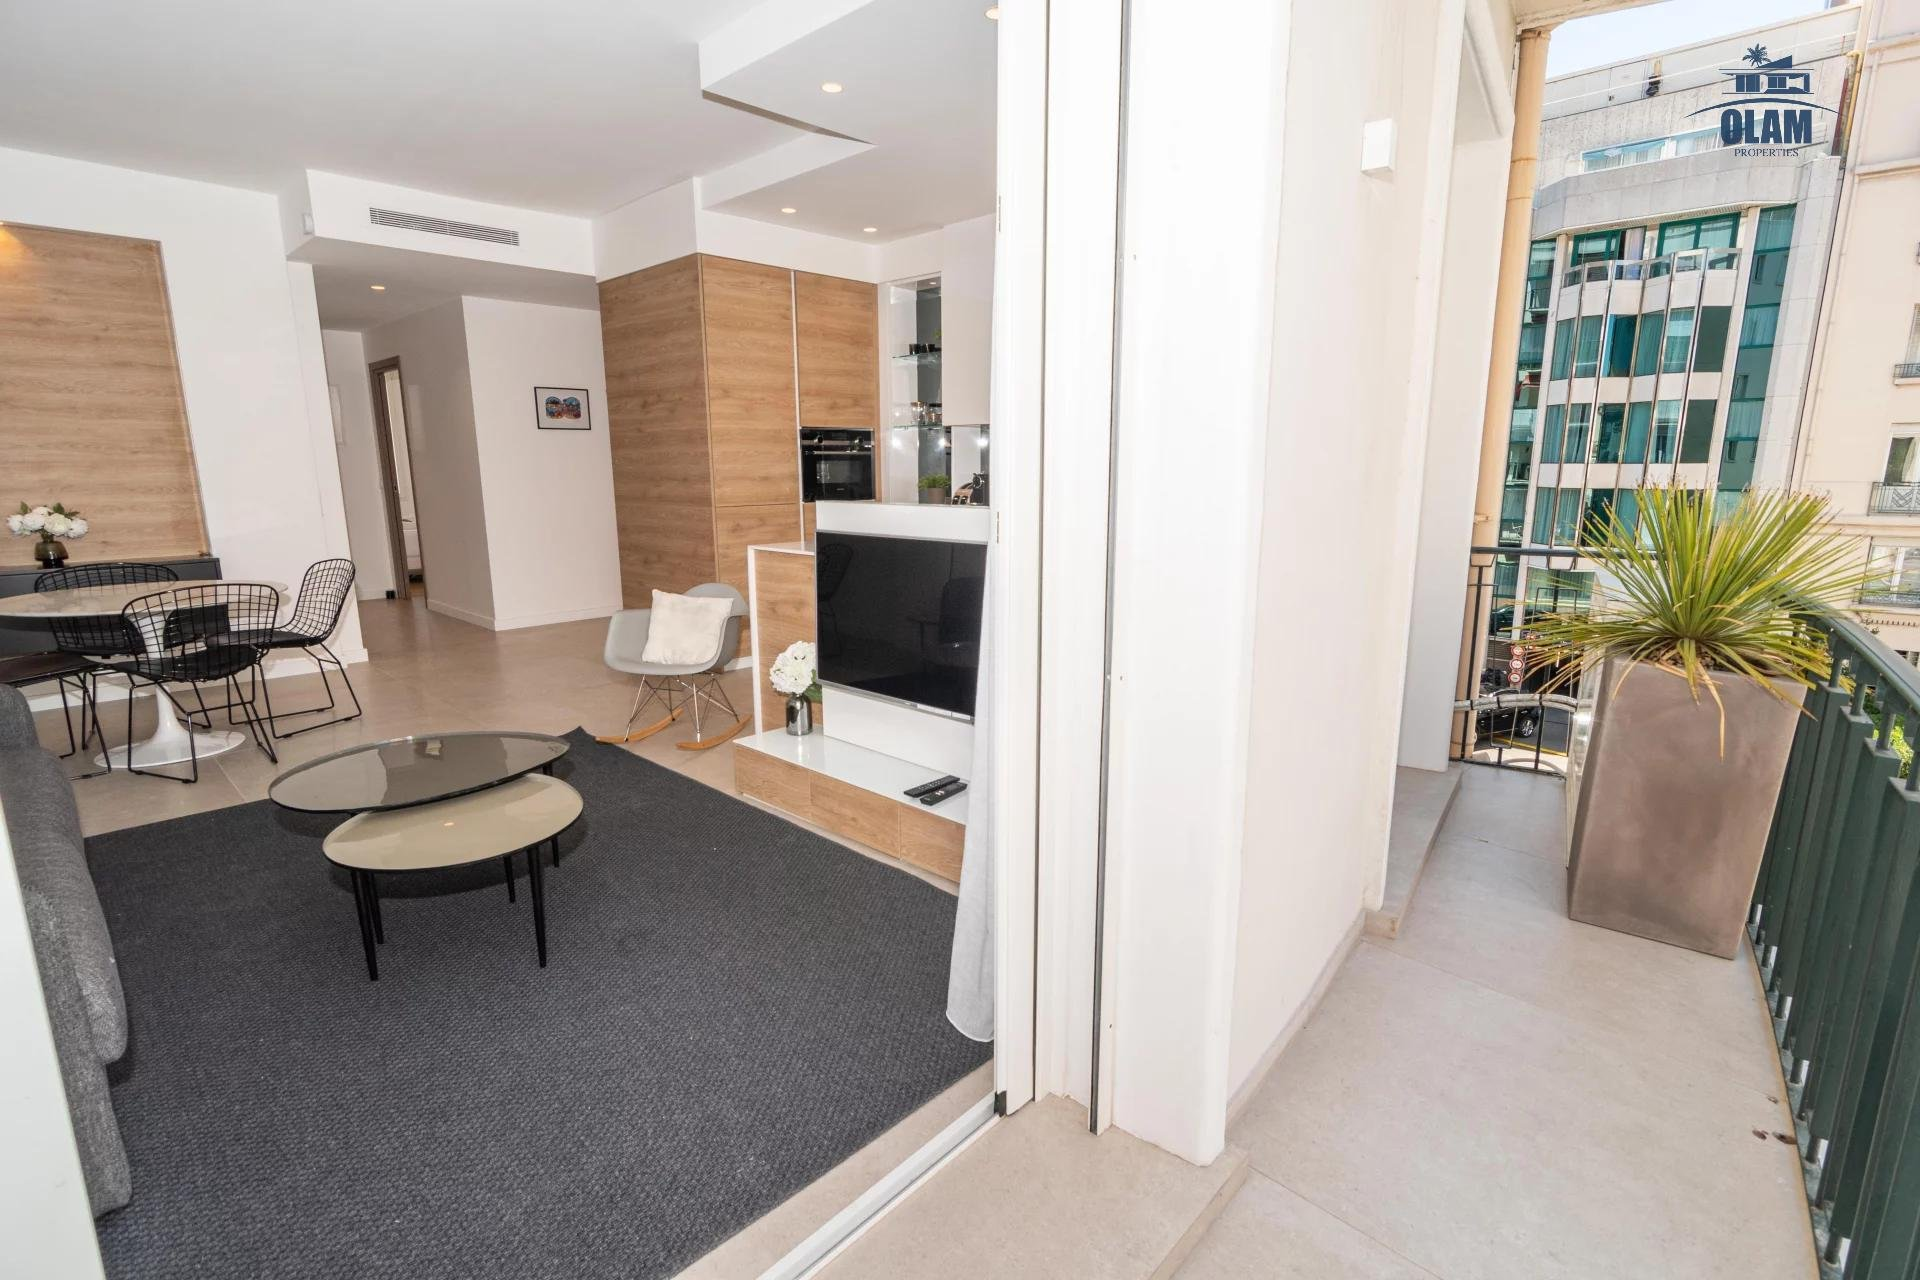 Сезонная аренда Квартира - Канны (Cannes)